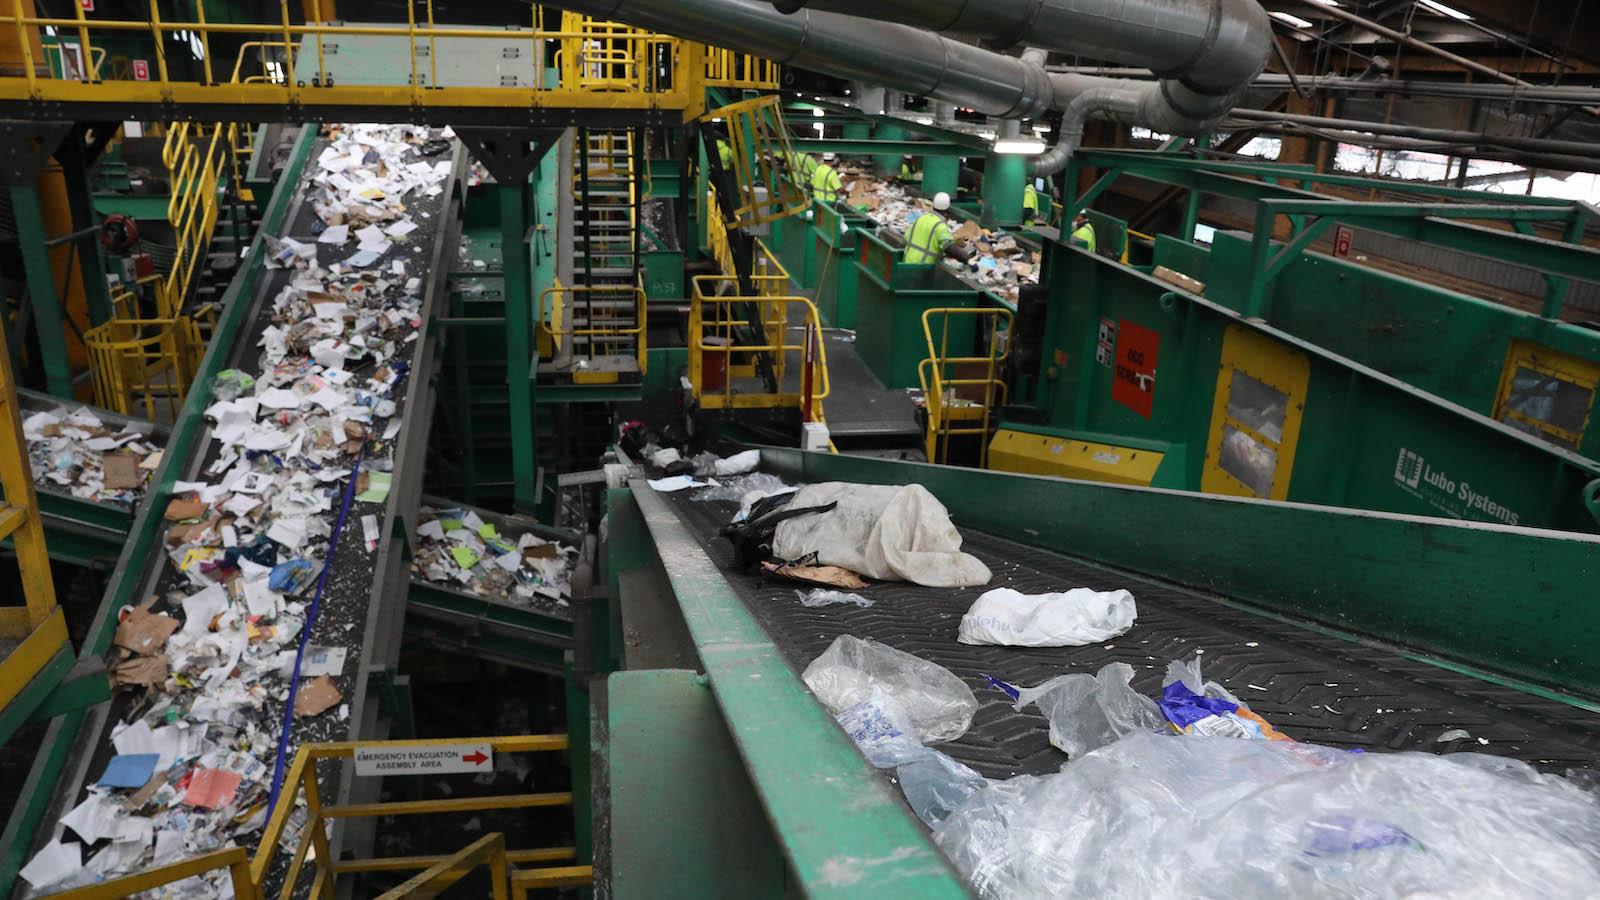 Conveyor belt with plastic on it.